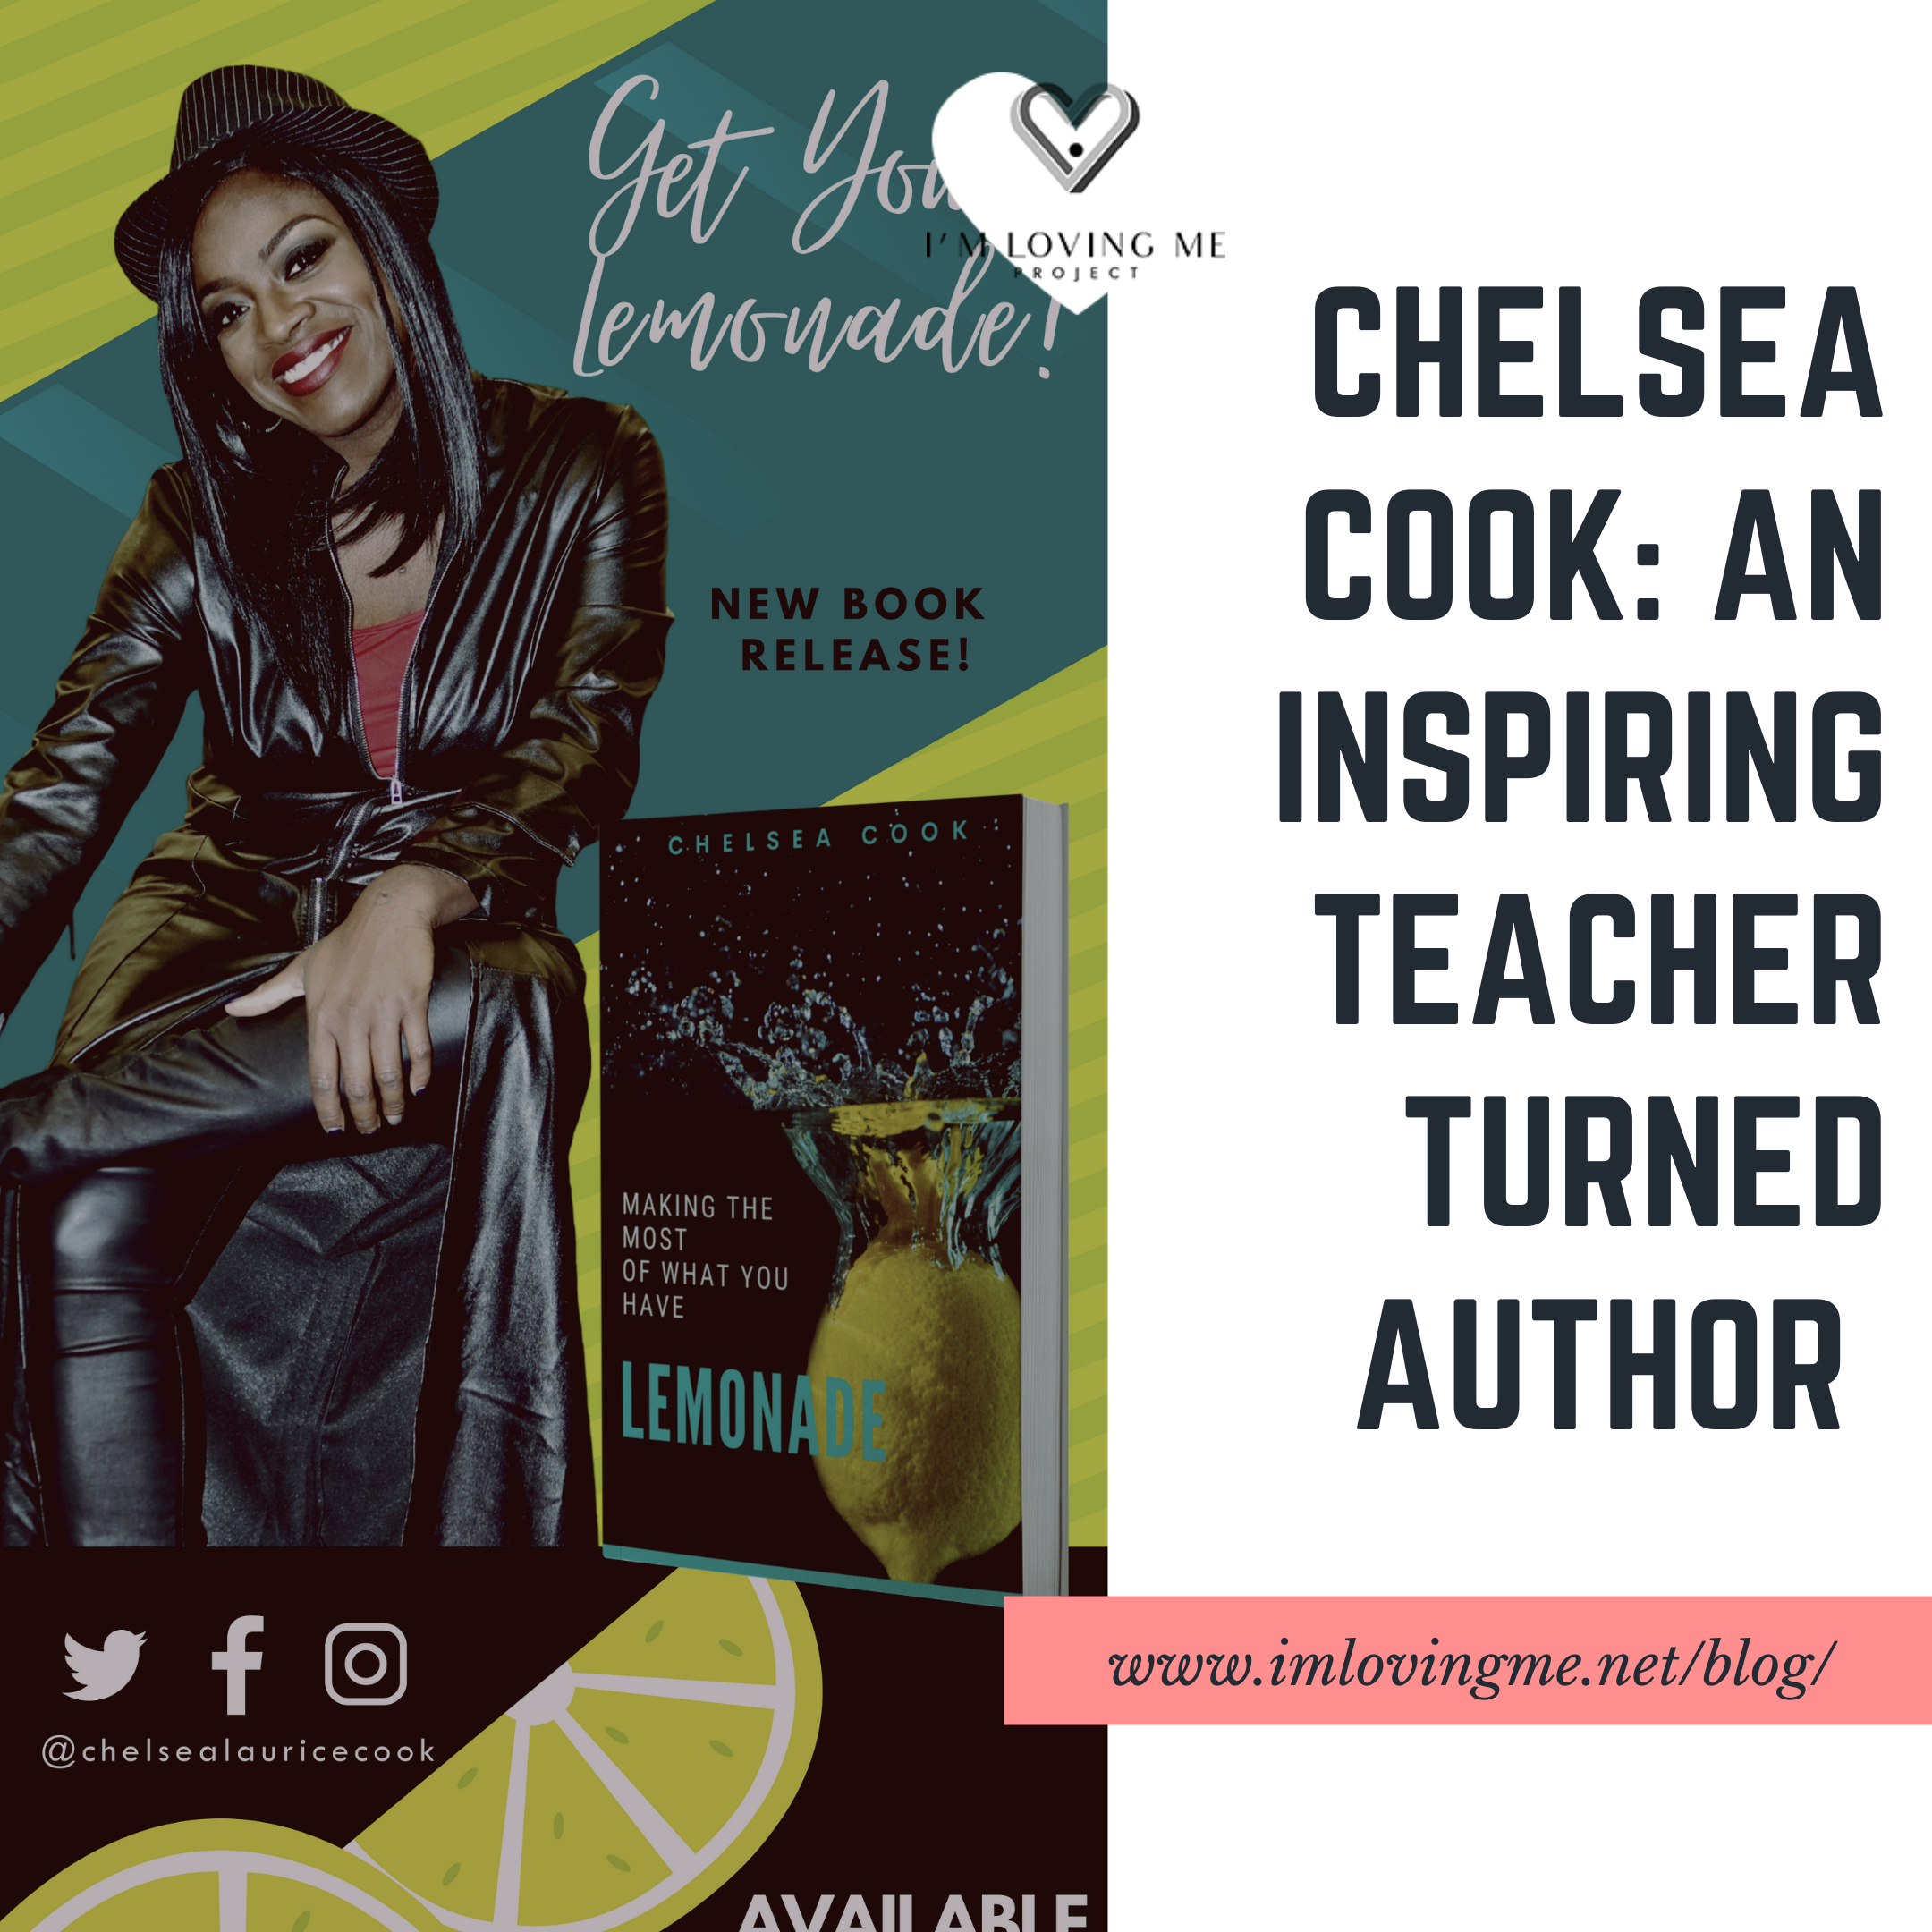 Chelsea Cook: An Inspiring Teacher Turned Author